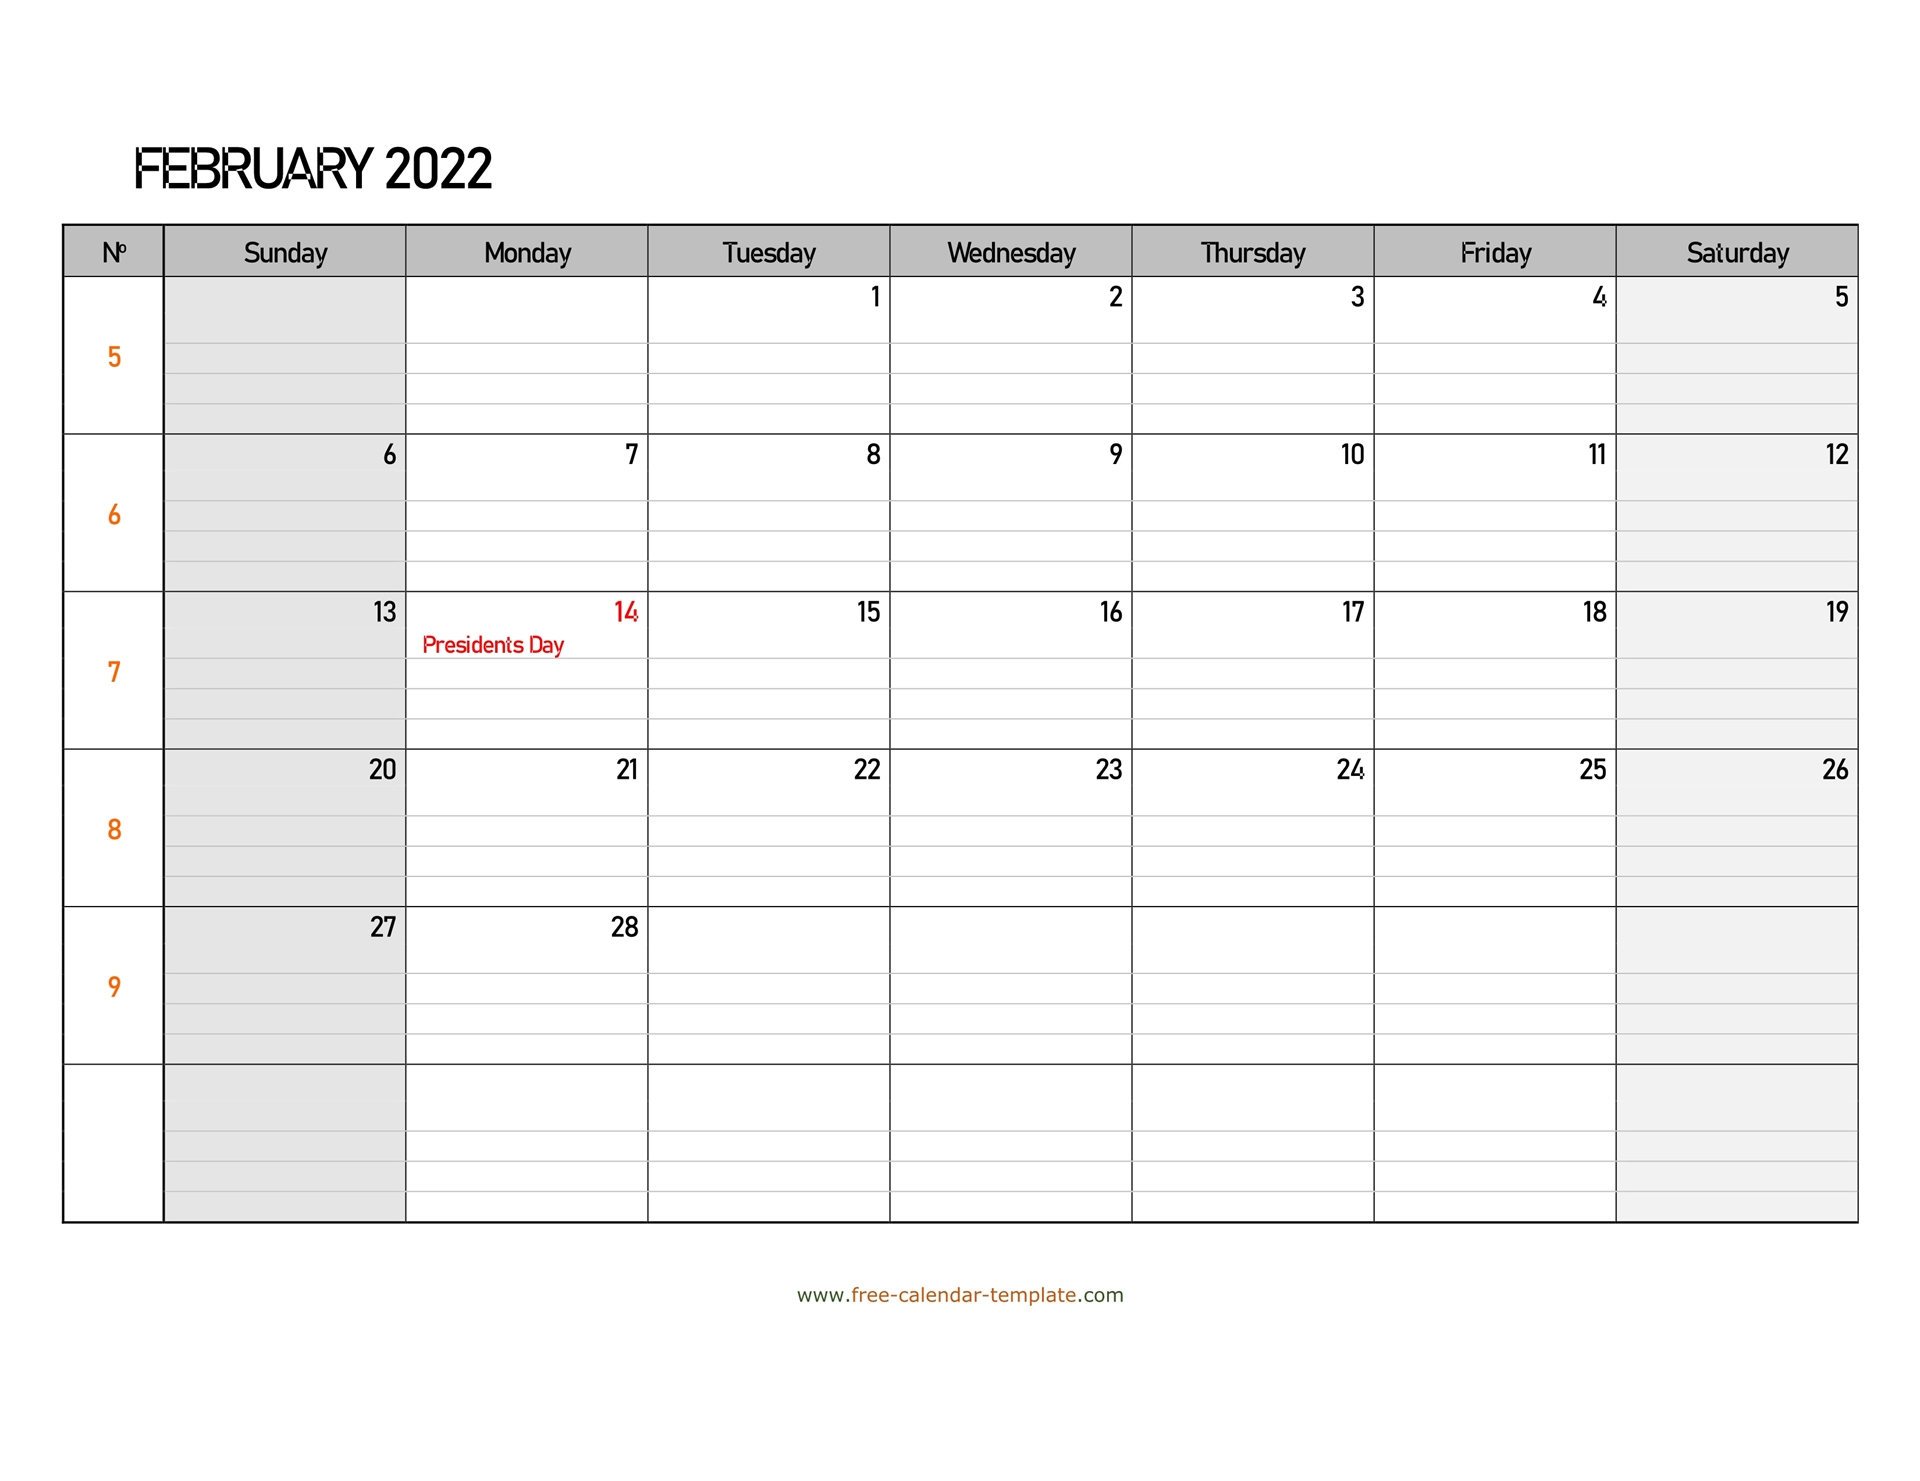 February 2022 Calendar Free Printable With Grid Lines For Calendar Print Feb 2022